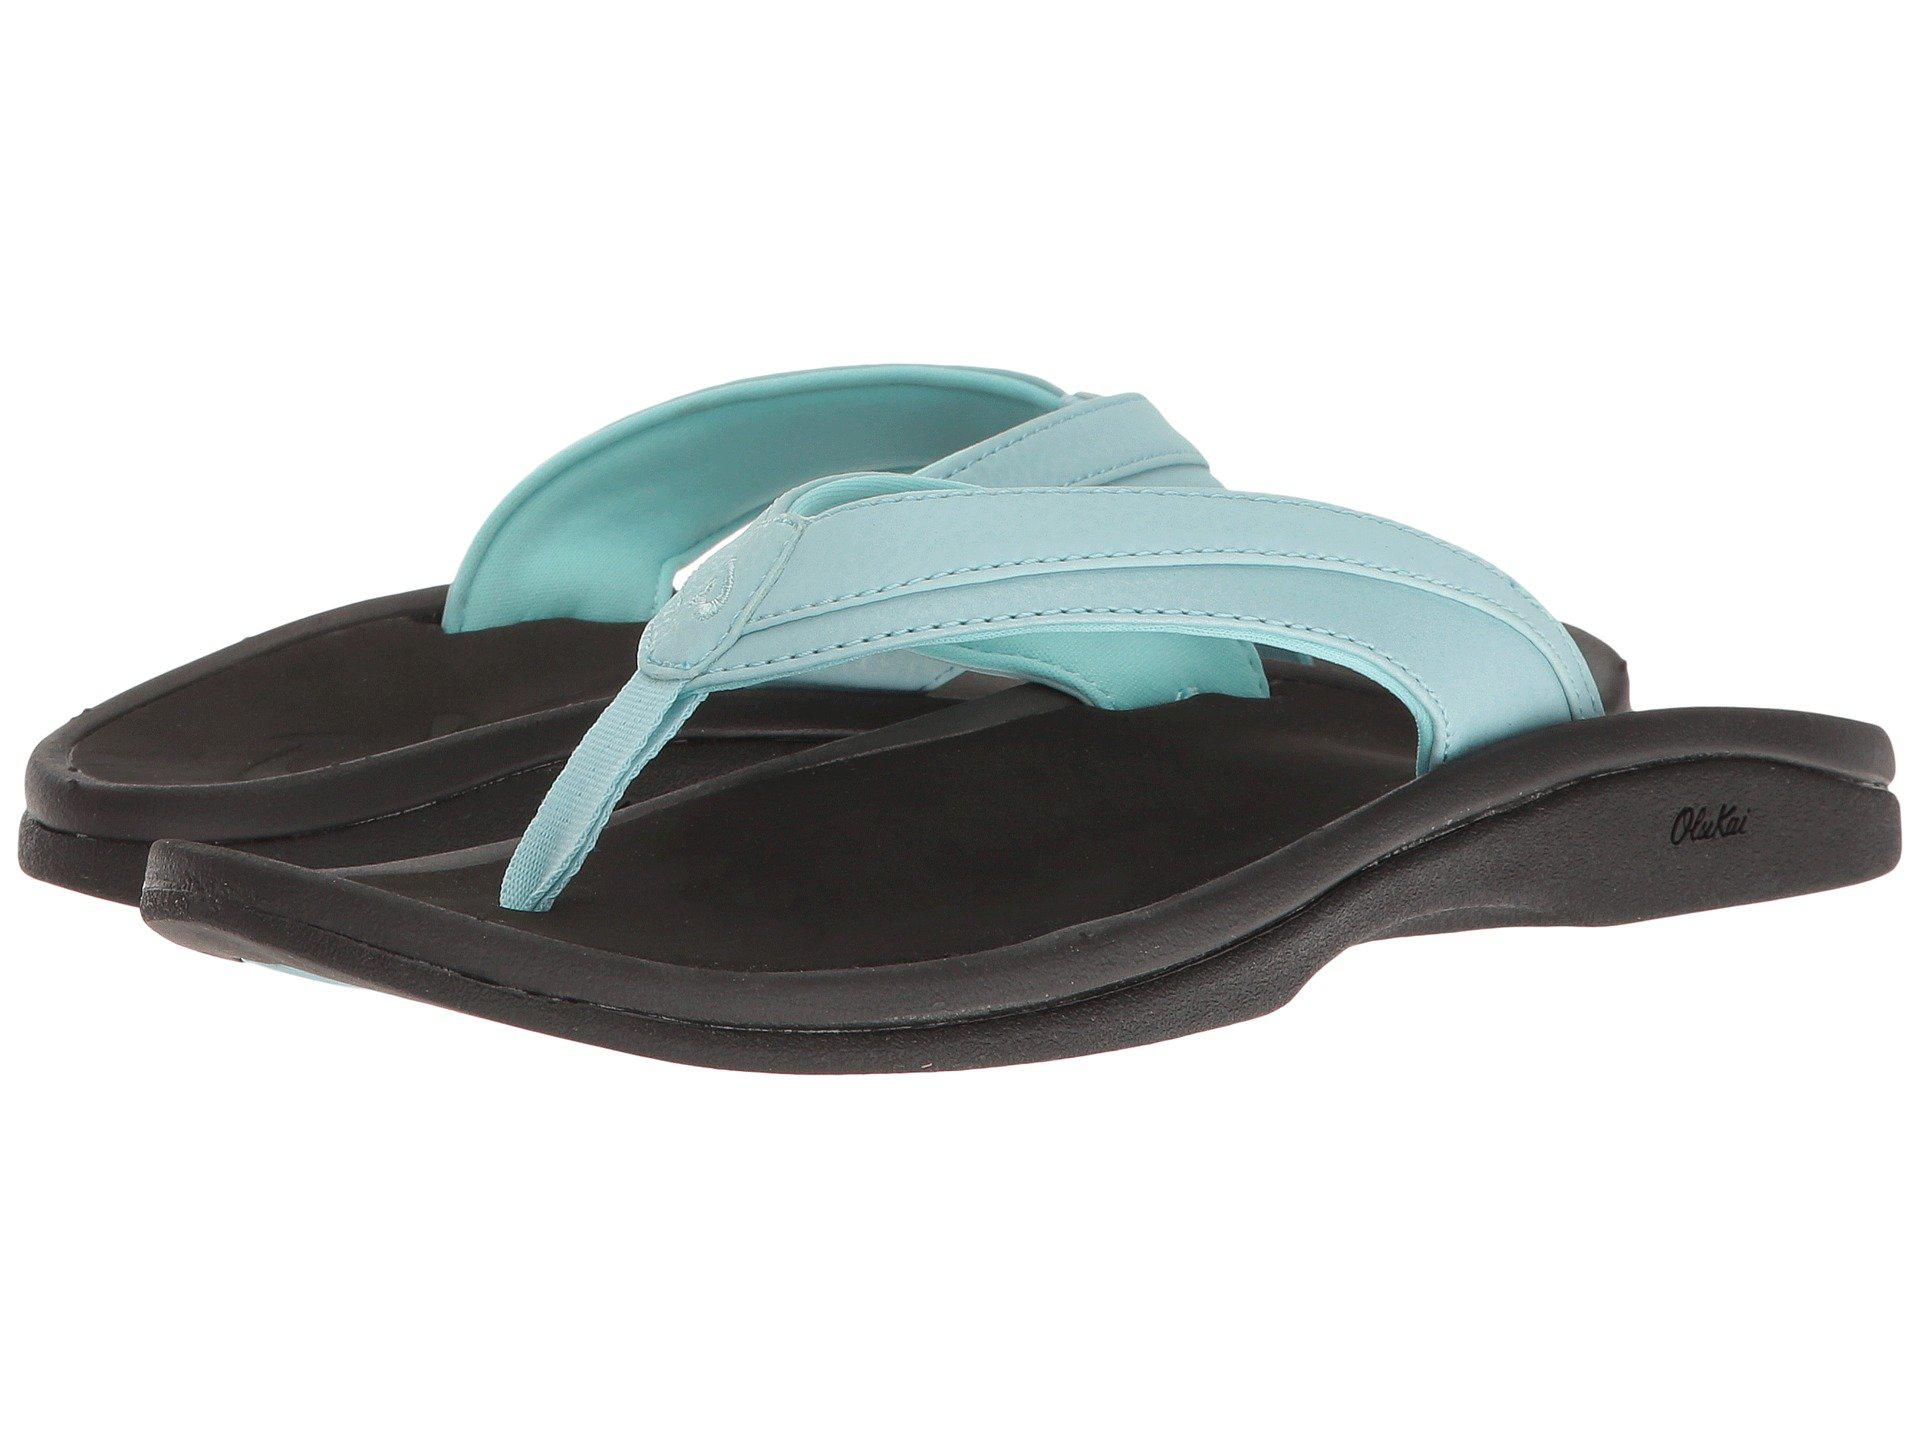 036d2bfe215 Lyst - Olukai Ohana W (blueberry black) Women s Sandals in Black